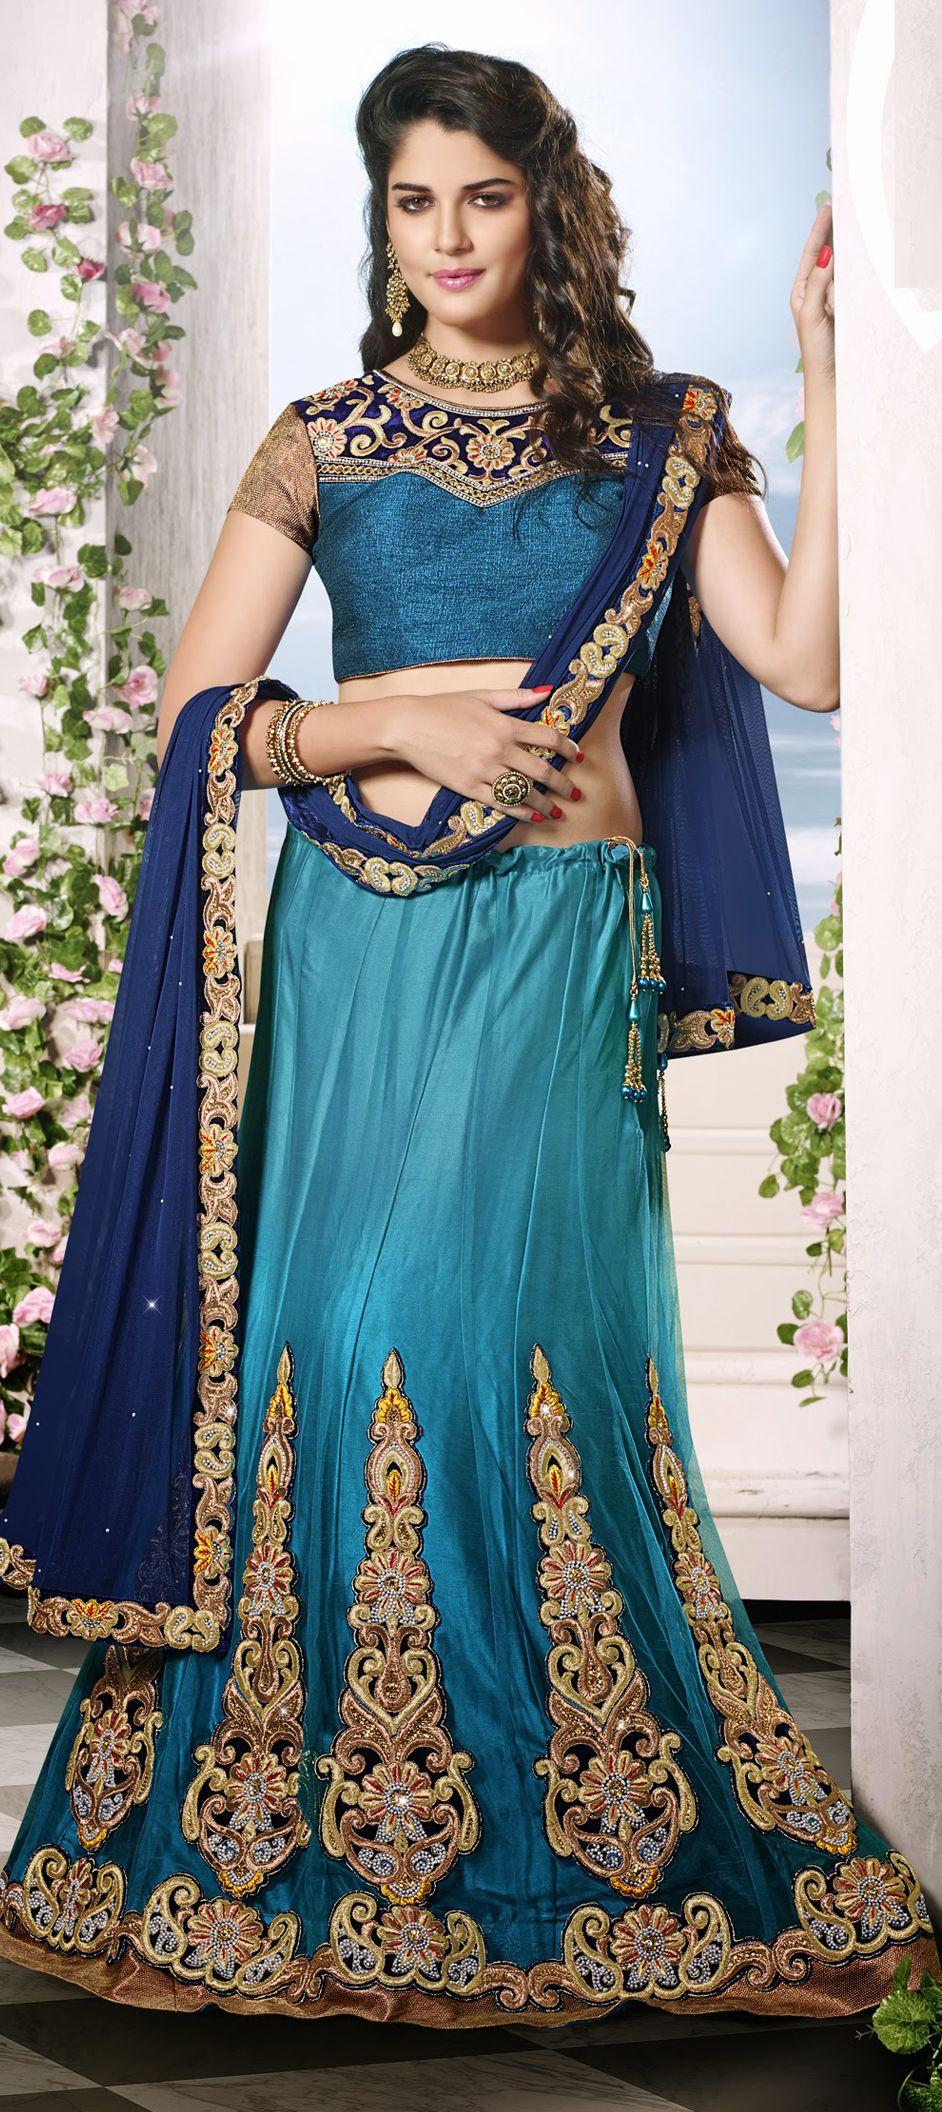 149273: Blue color family Bollywood Lehenga. | Indian Lovely Lehenga ...